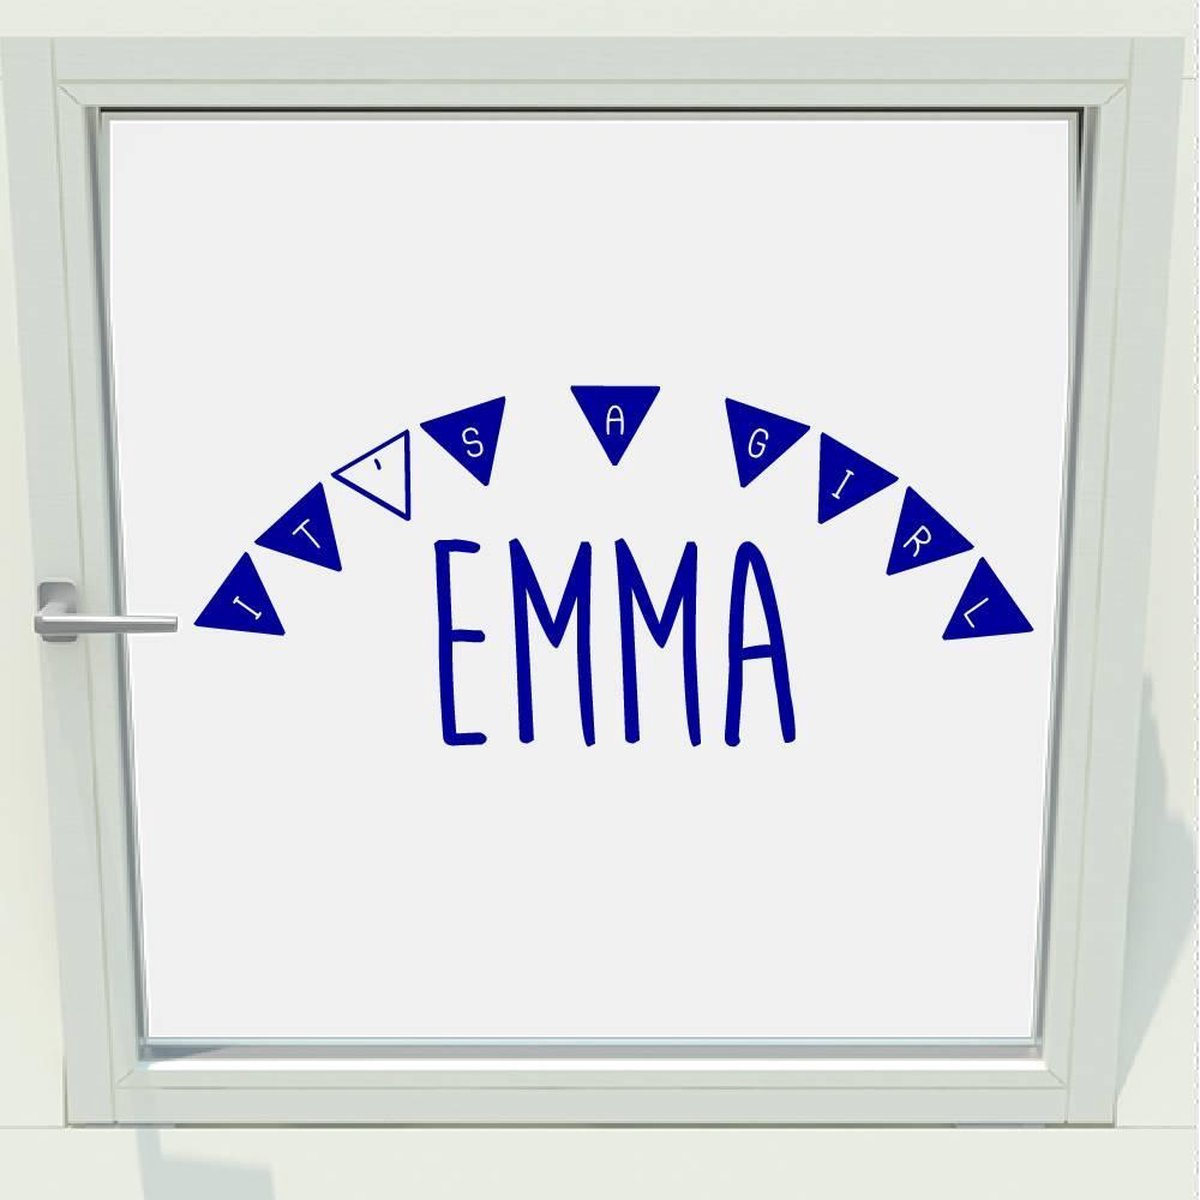 Geboorte Sticker It's A Girl Met Naam -  Donkerblauw -  100 x 42 cm  - raam en deur stickers - geboorte stickers   - Muursticker4Sale